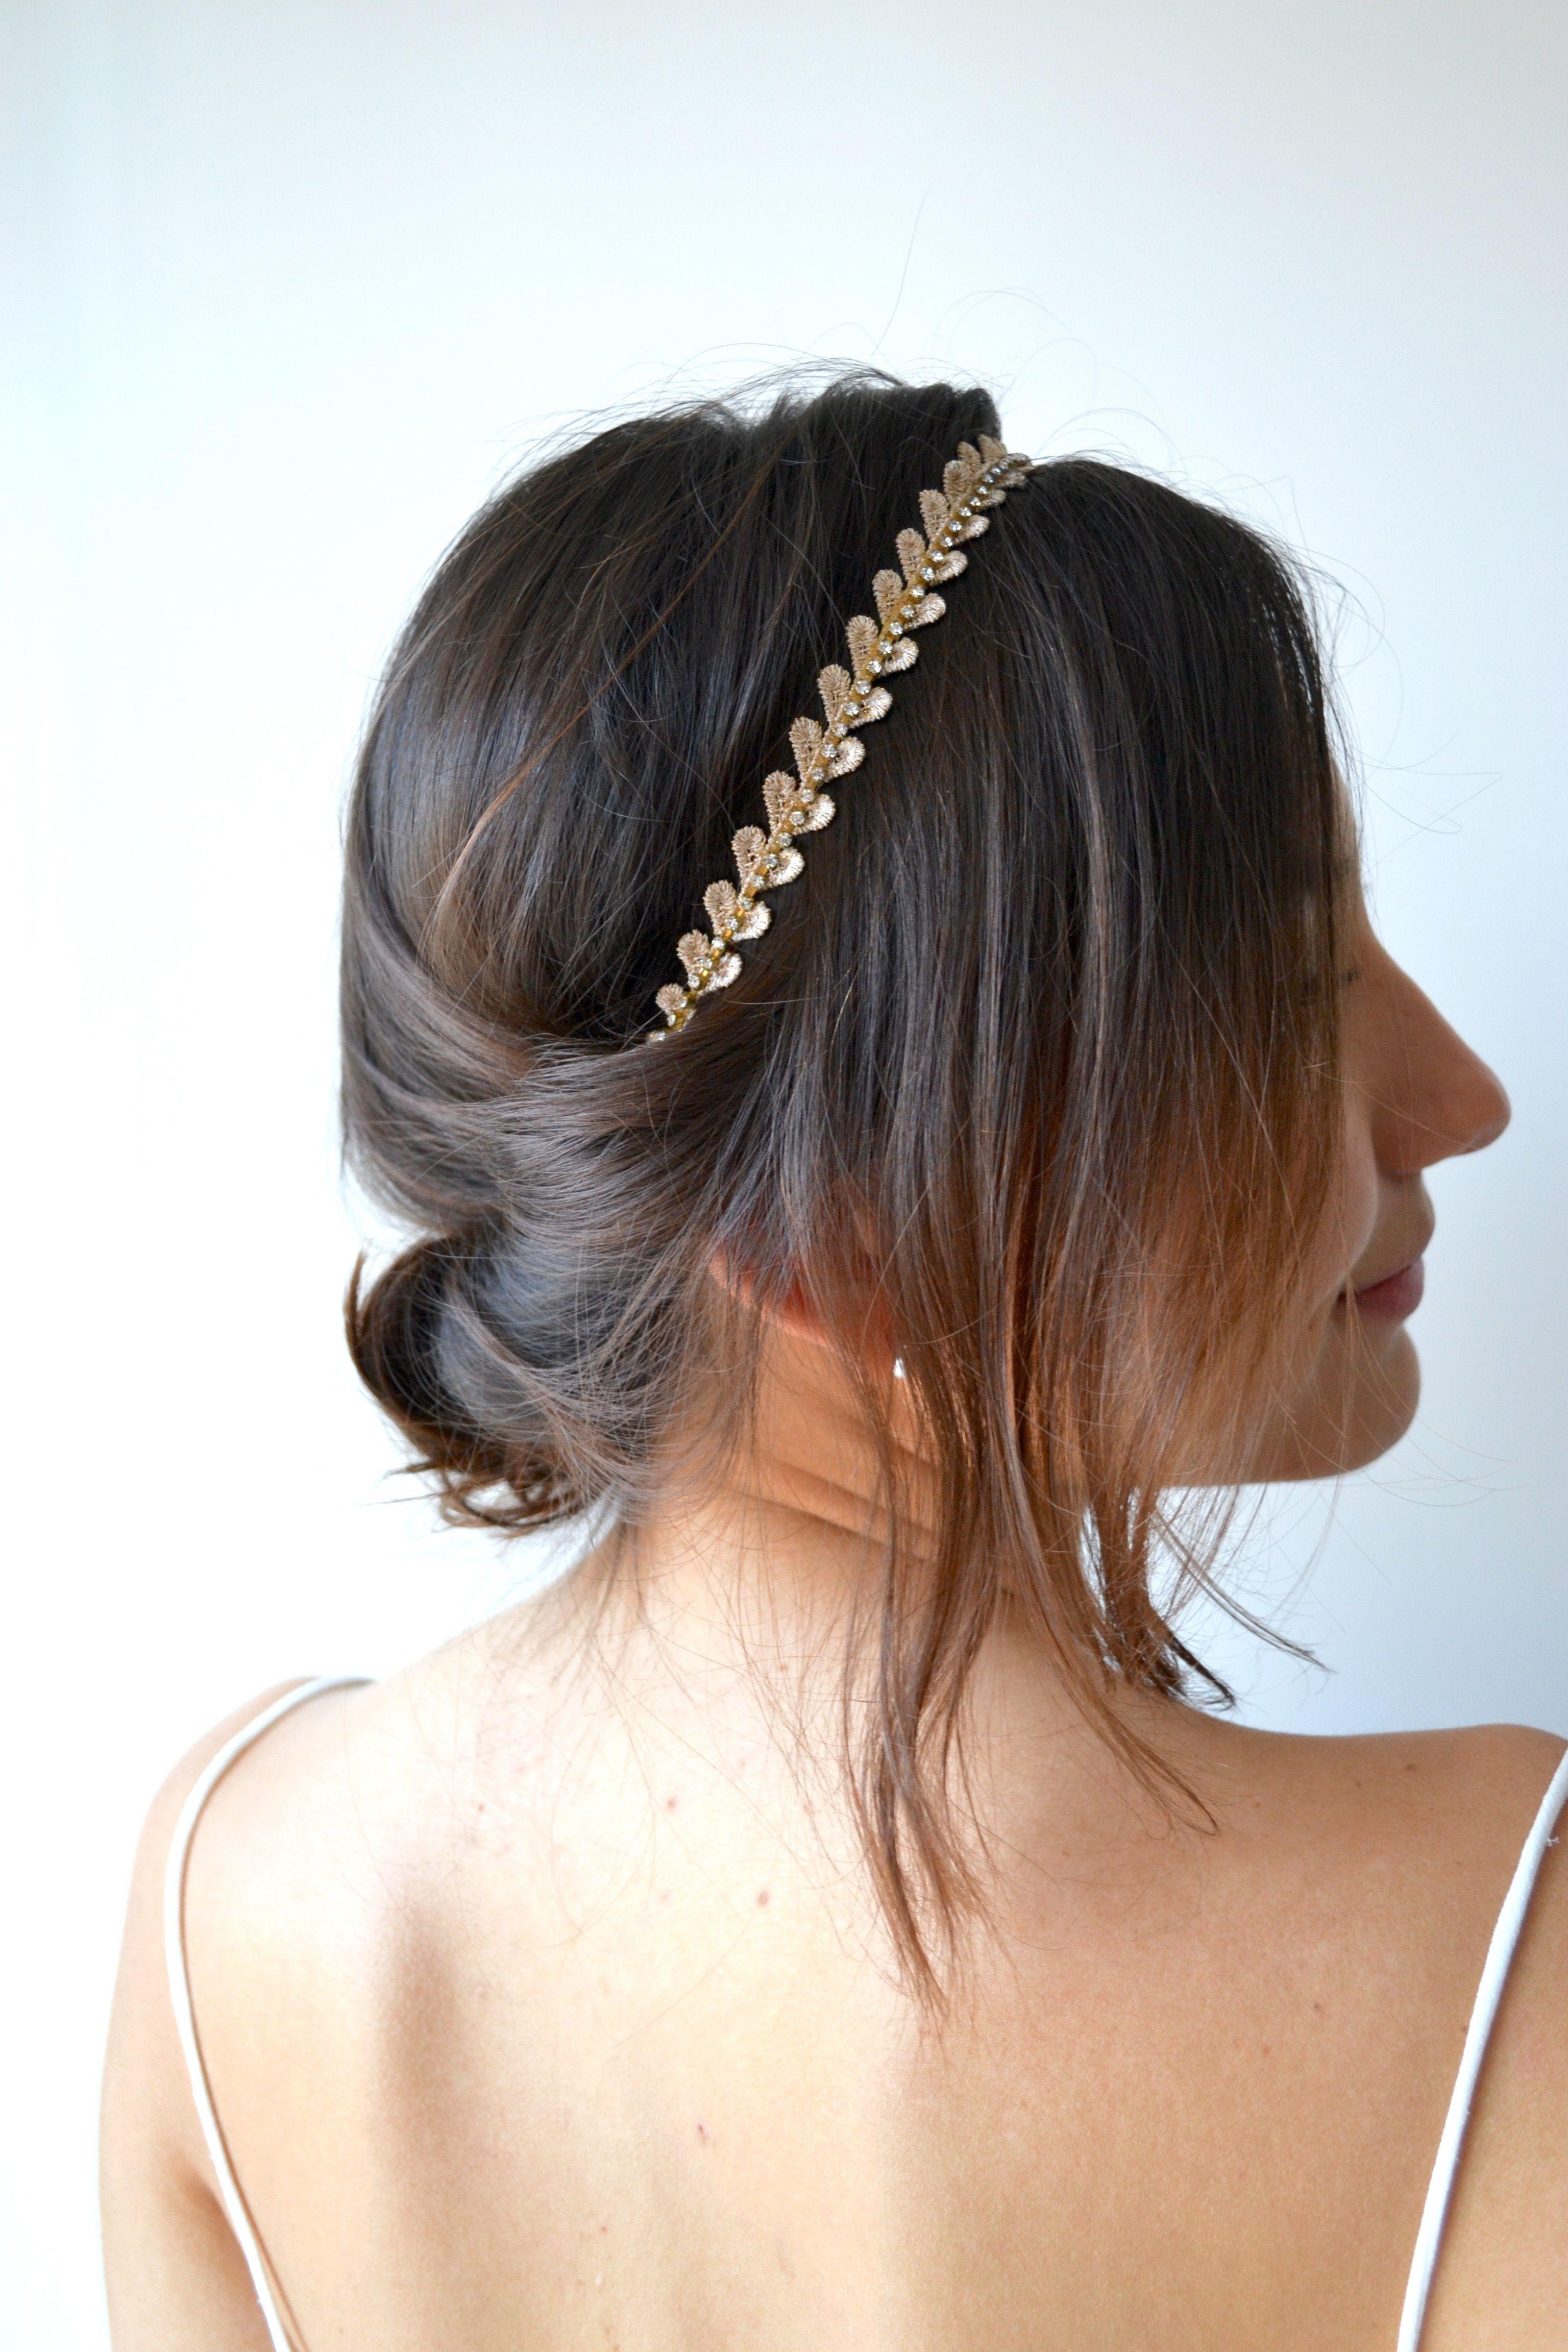 Femmes Feuilles Head Chaîne de bijouterie Serre-tête Mariage Head Piece Hair Accessory